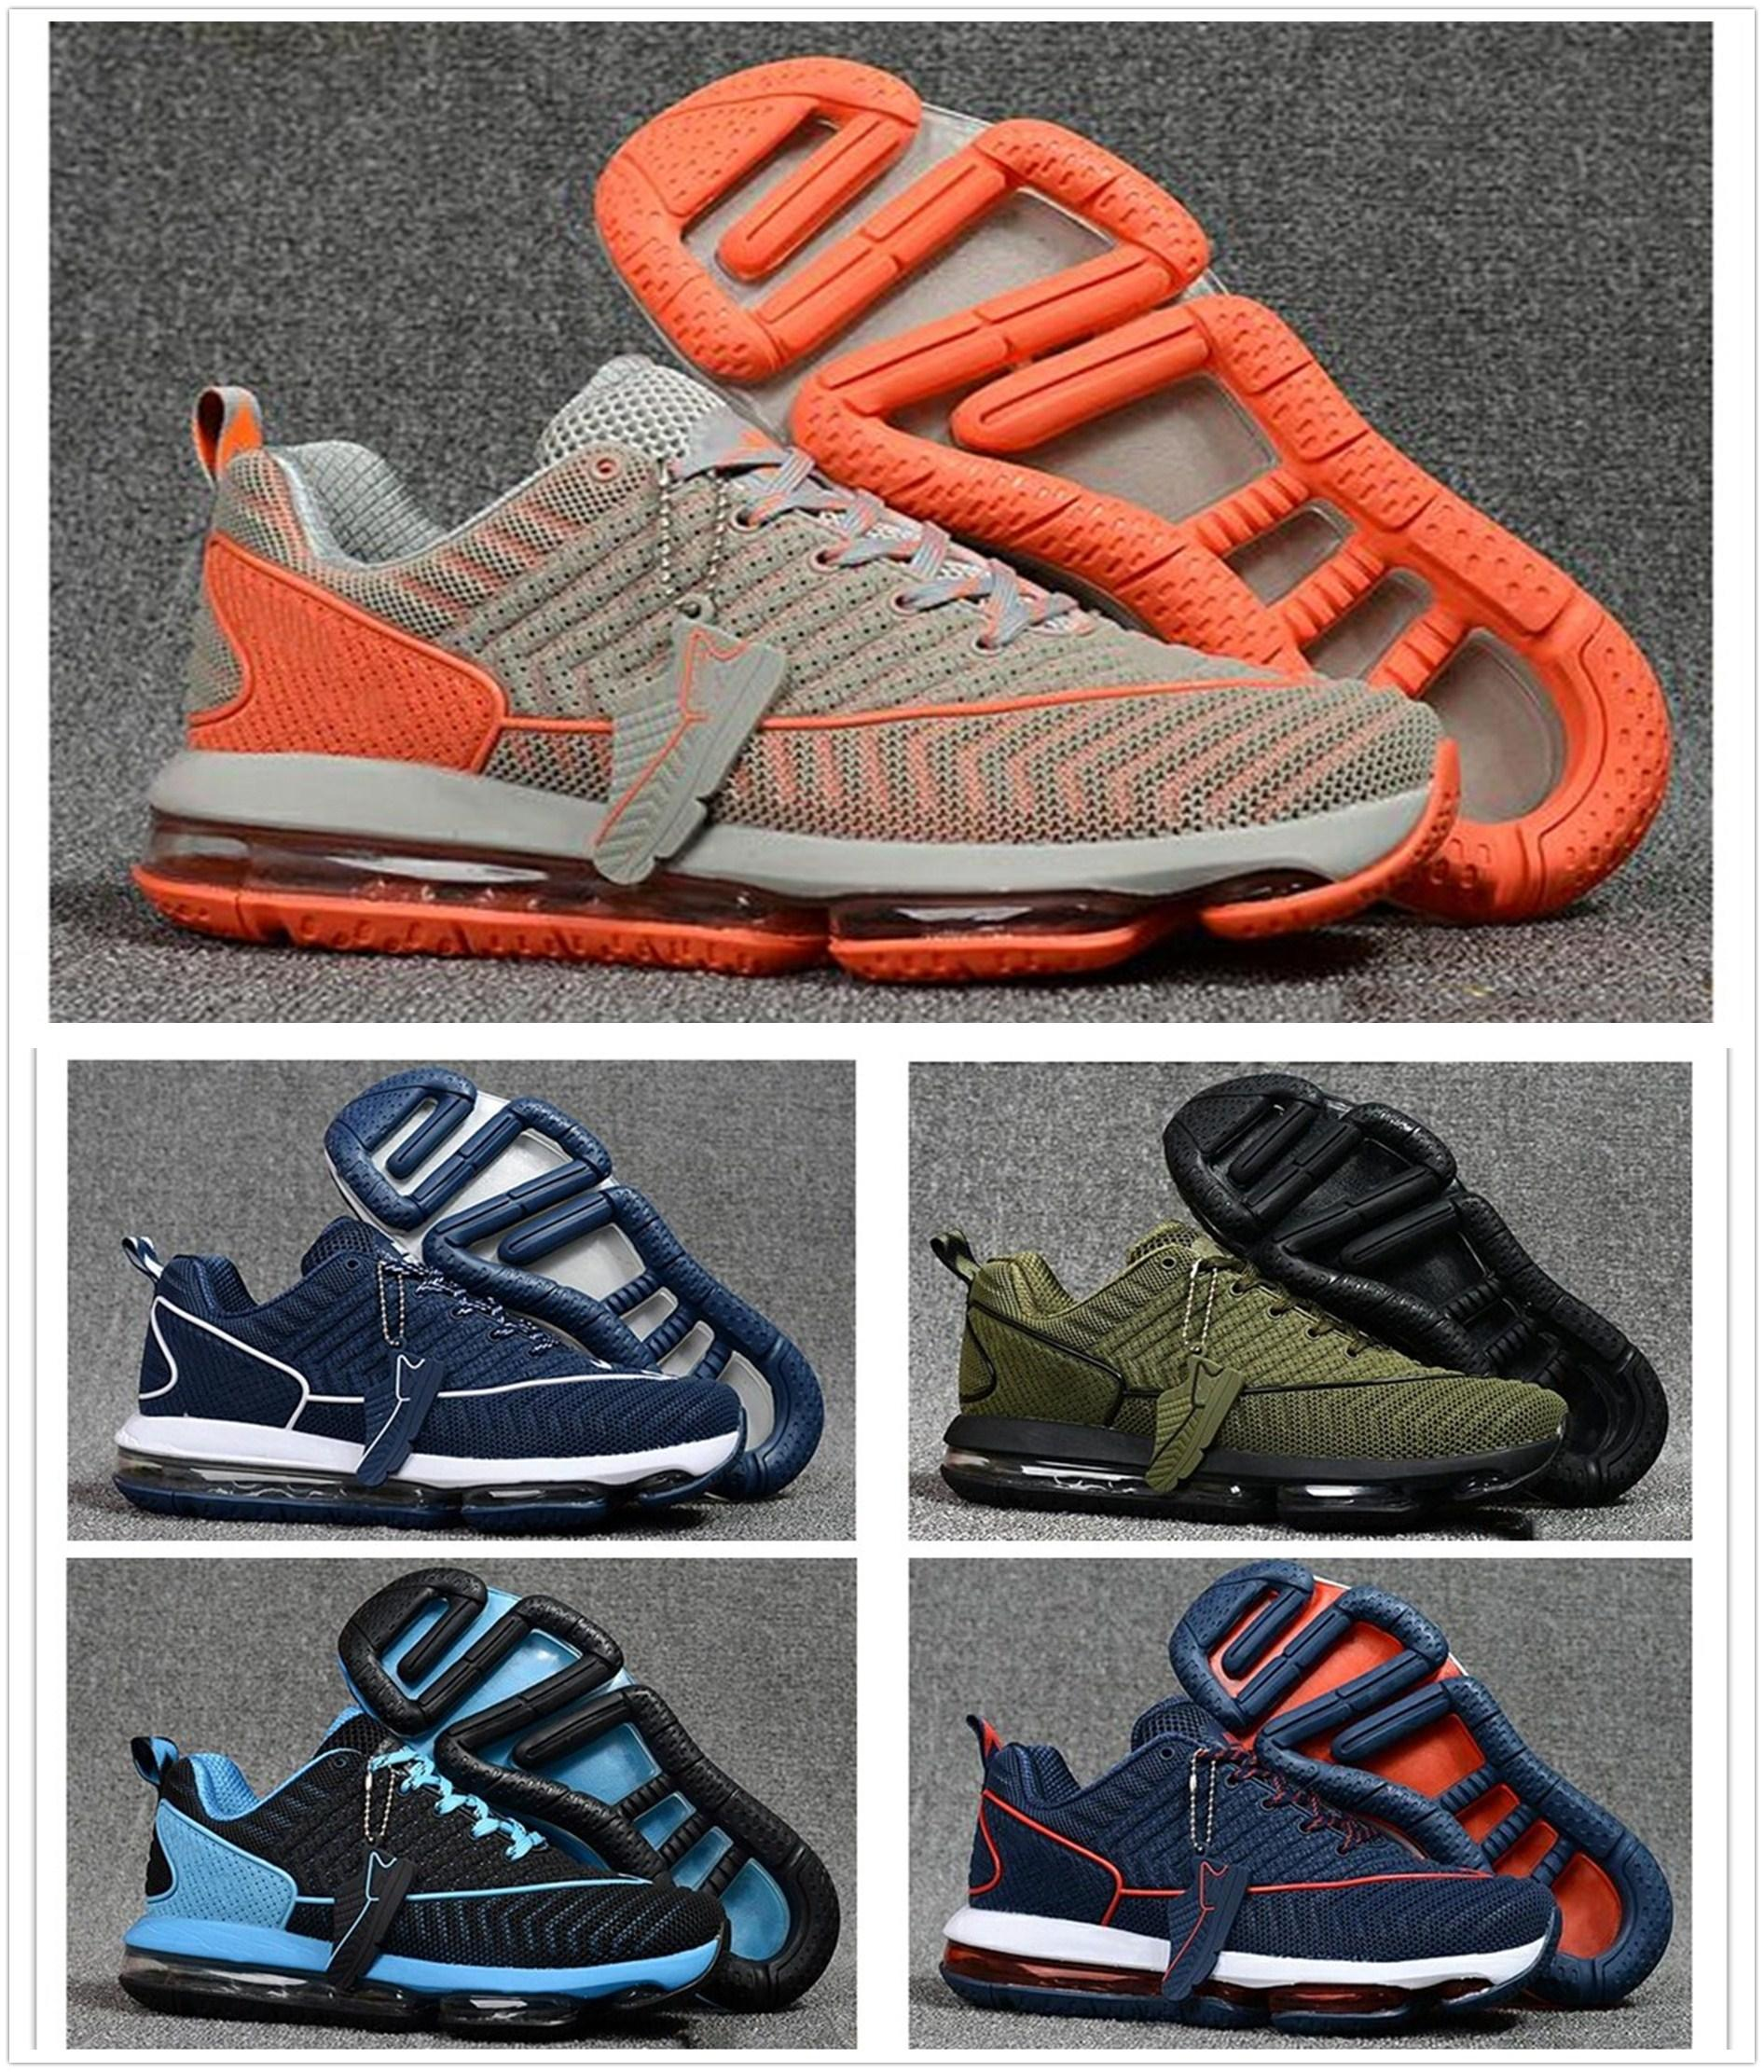 reputable site aa8e7 34e4b 2019 New Unveils Vapormaxes Mens Casual Shoes Trainers Tennis Vapor Maxes  Shoes Hot Corss Hiking Jogging Casual Shoes Size 40-46